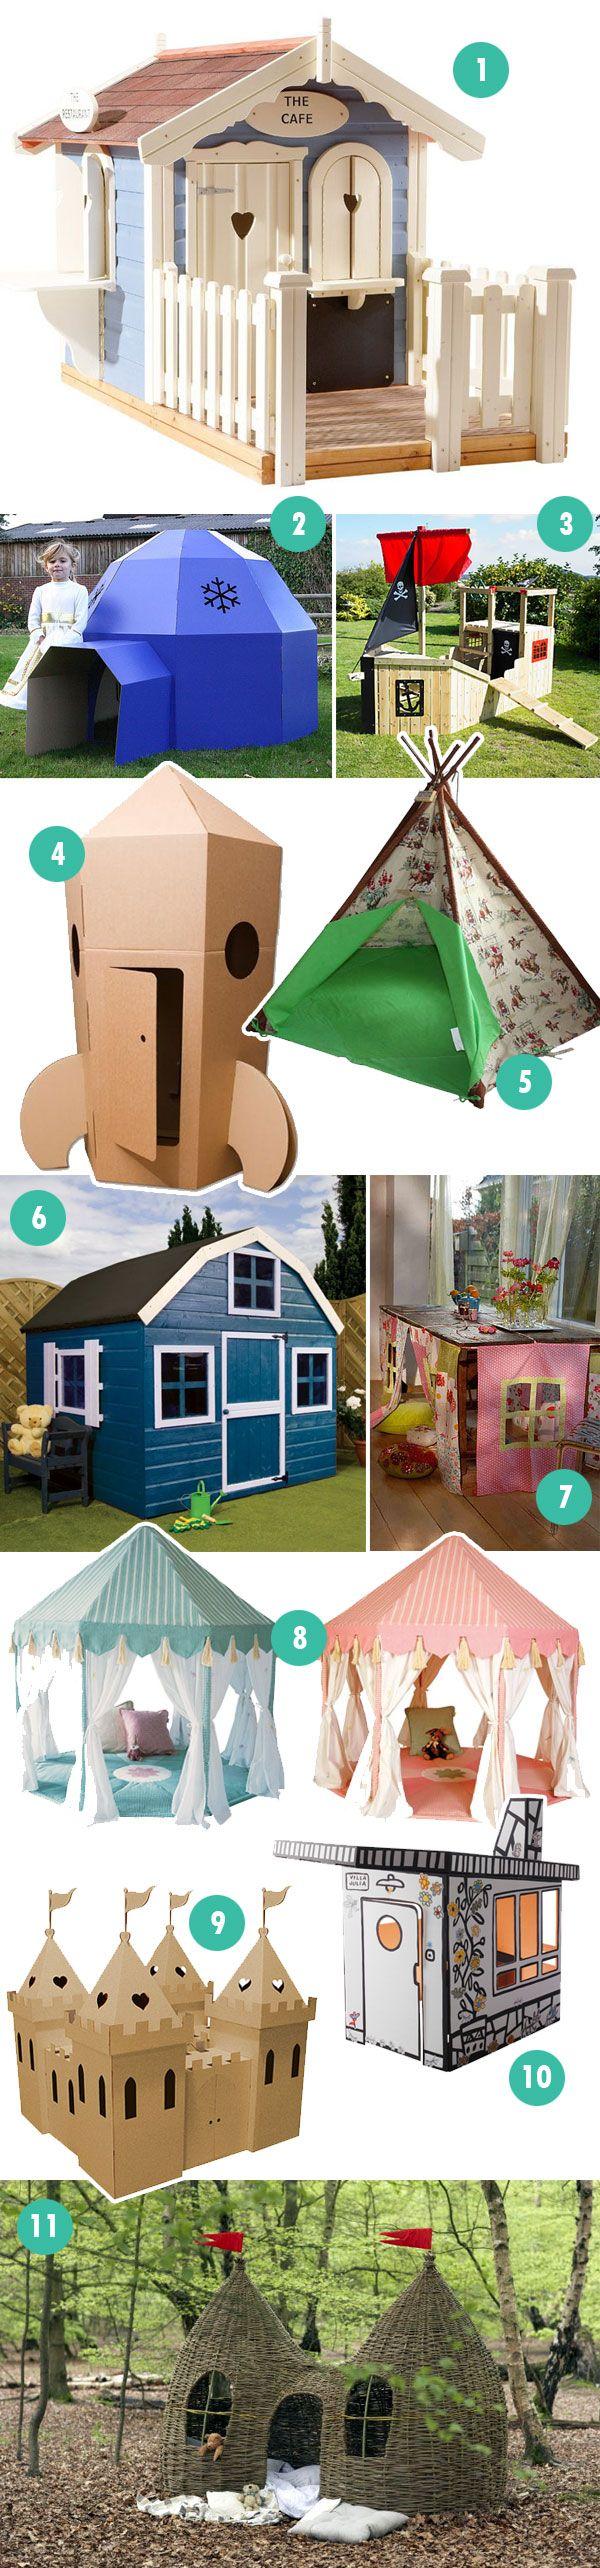 Play houses, dens, play barns, tents